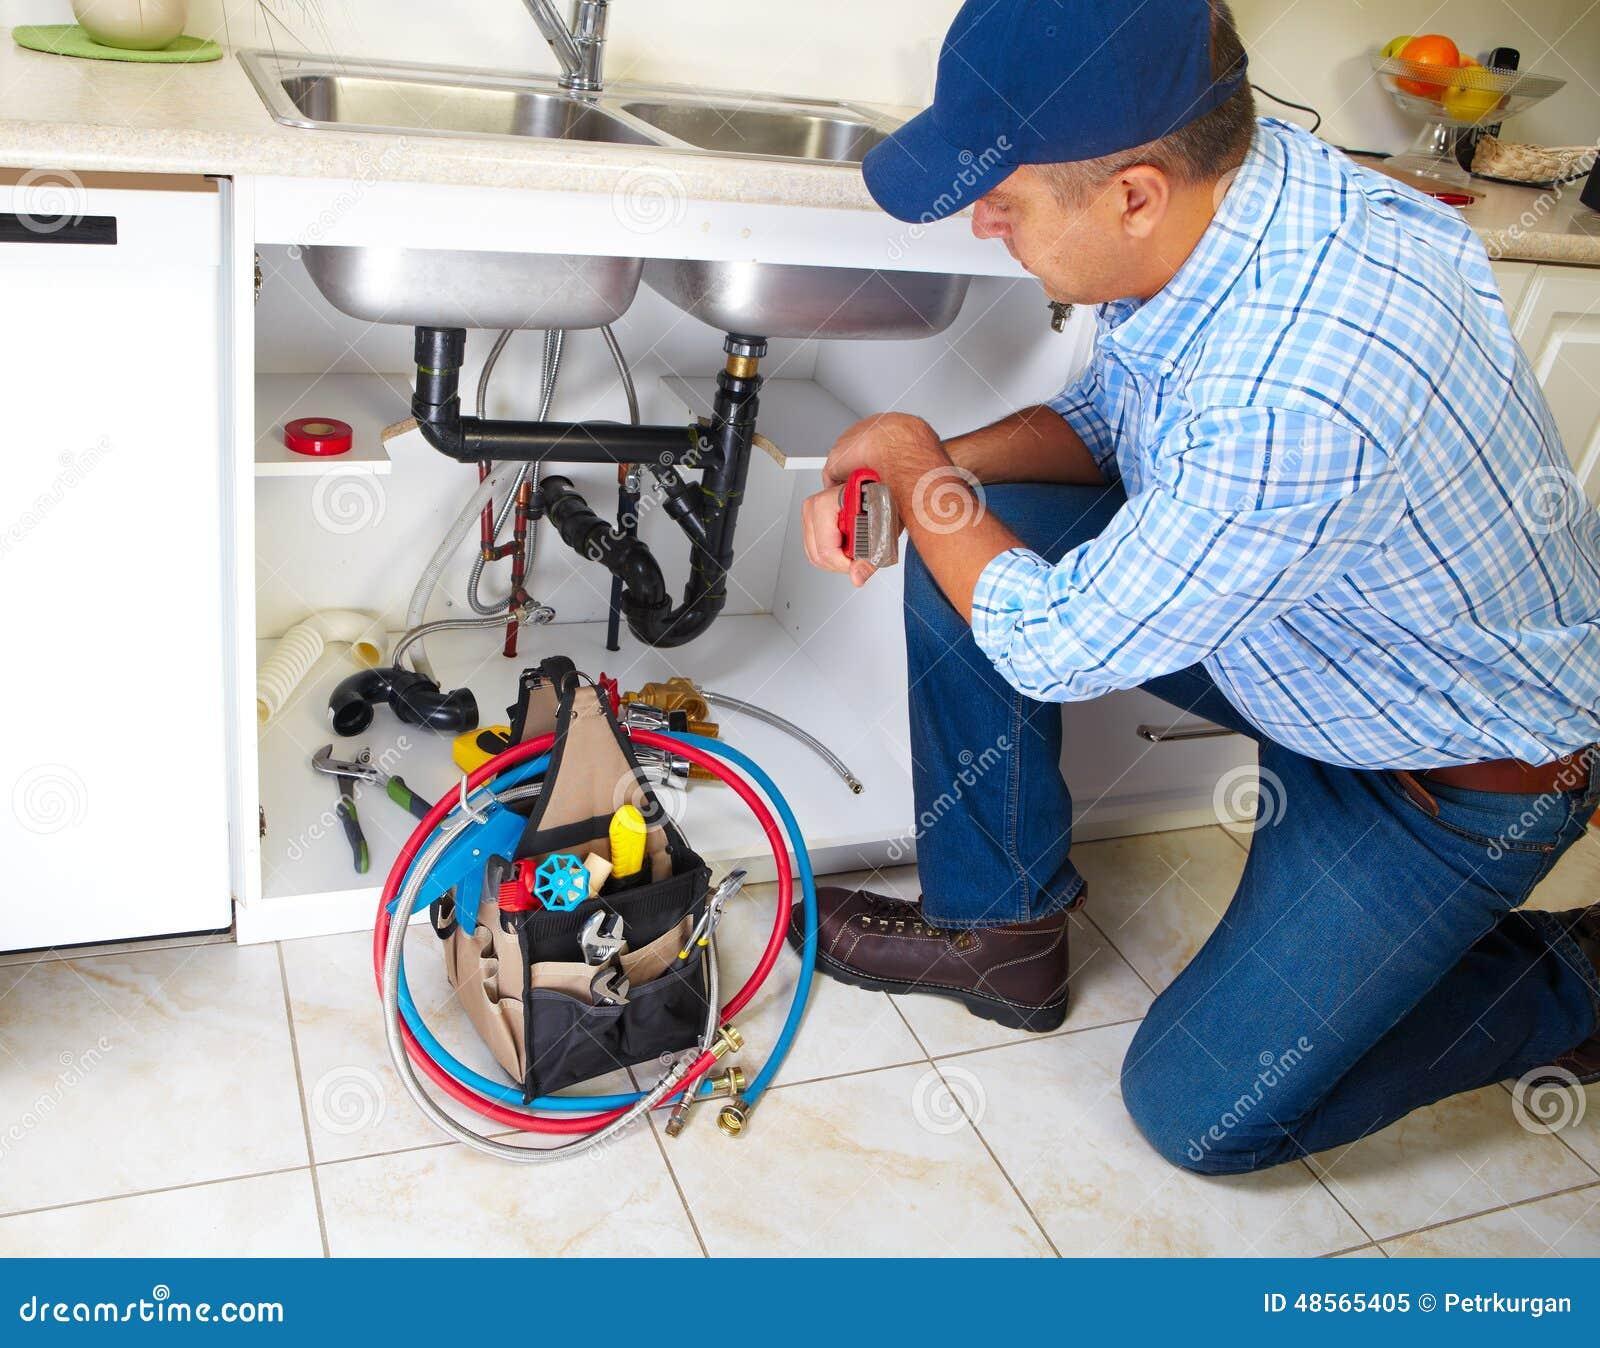 Kitchen Renovation Online Tool: Plumber On The Kitchen. Stock Photo